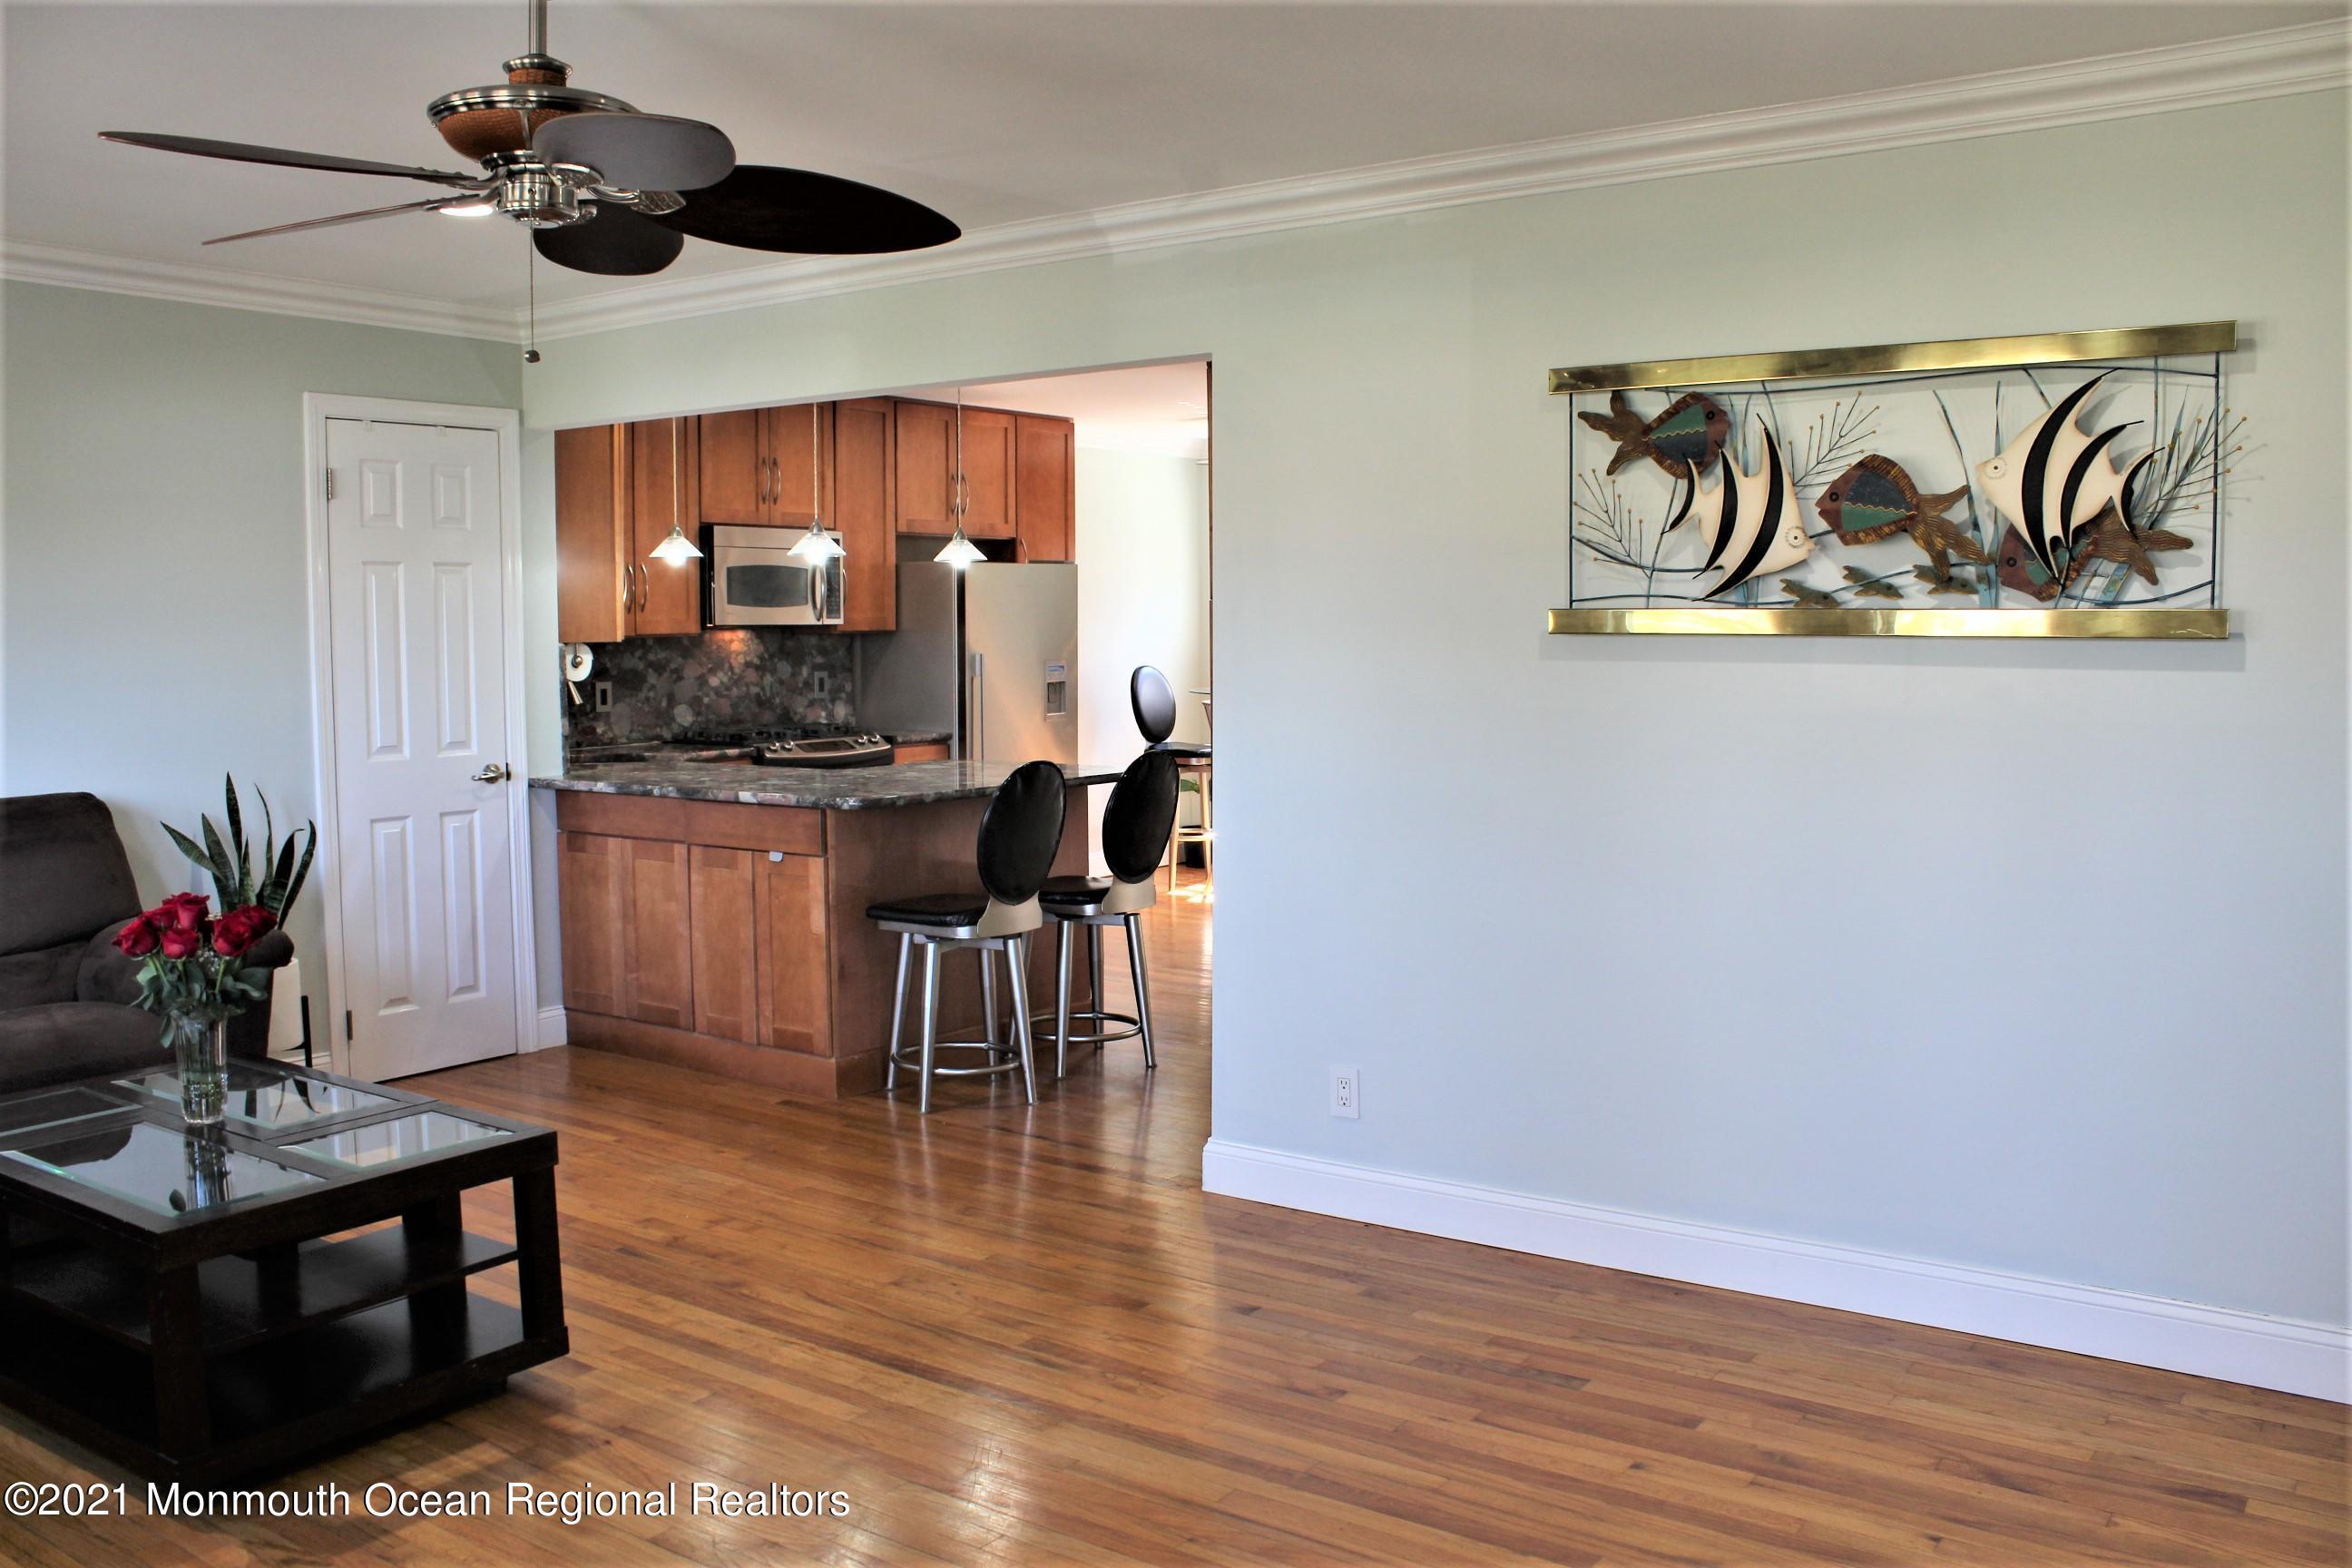 310 Maryland Avenue, Point Pleasant Beach, New Jersey 08742, 1 Bedroom Bedrooms, ,1 BathroomBathrooms,Condominium,For Sale,310 Maryland Avenue,1,22109725